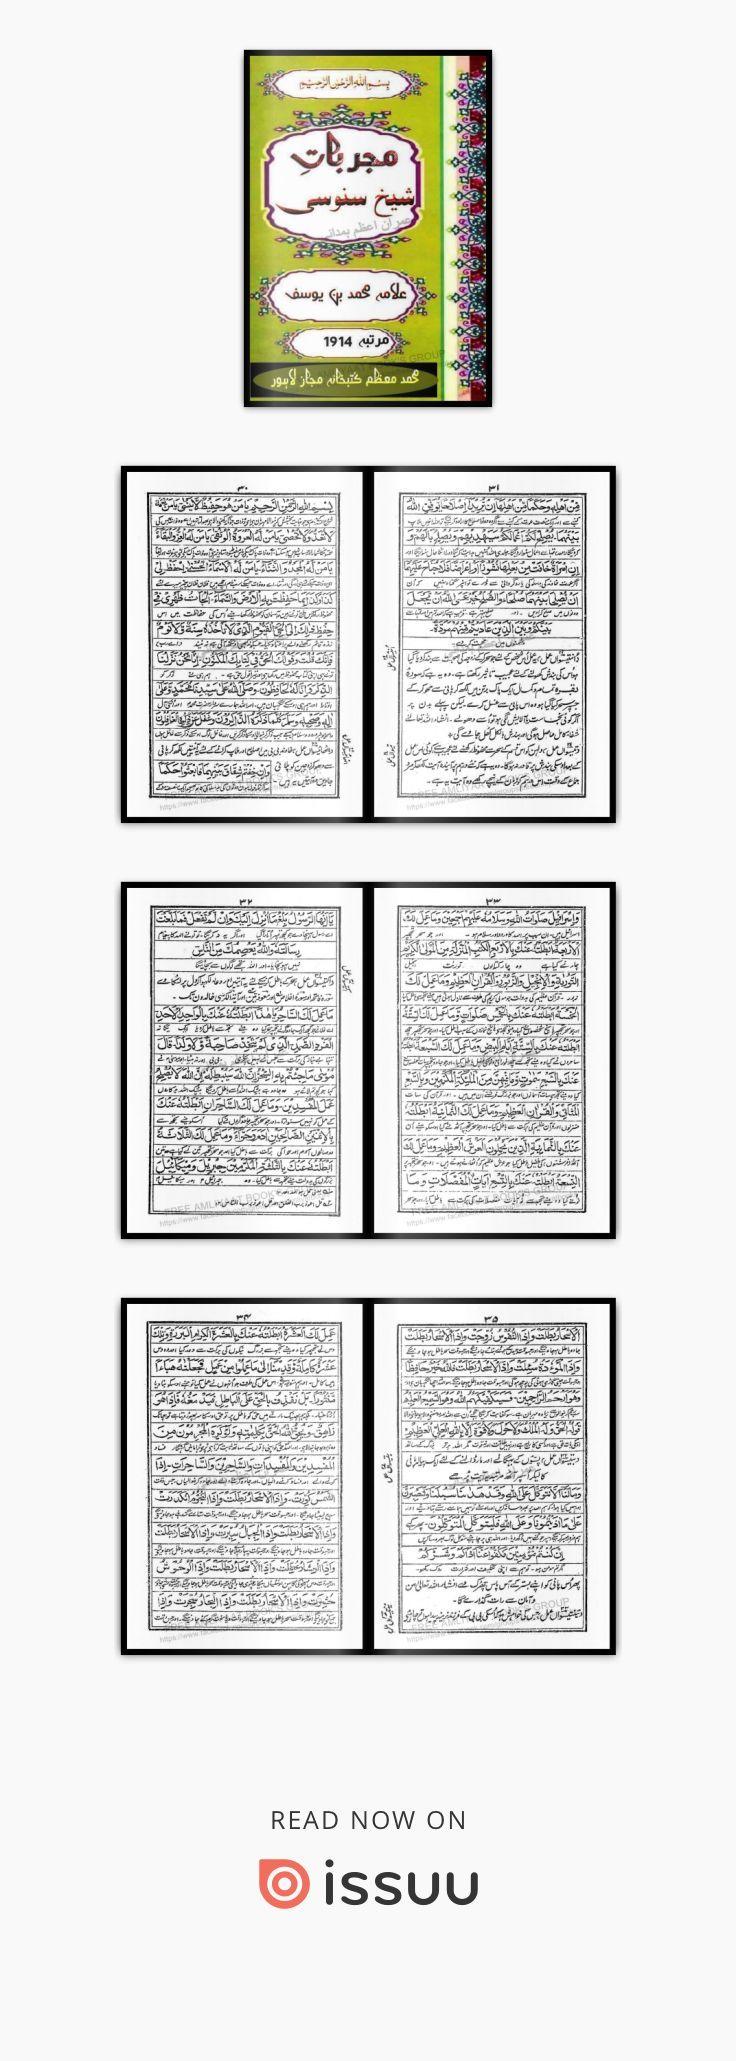 Mujarribaat shaikh sanoosi Make it simple, Reading